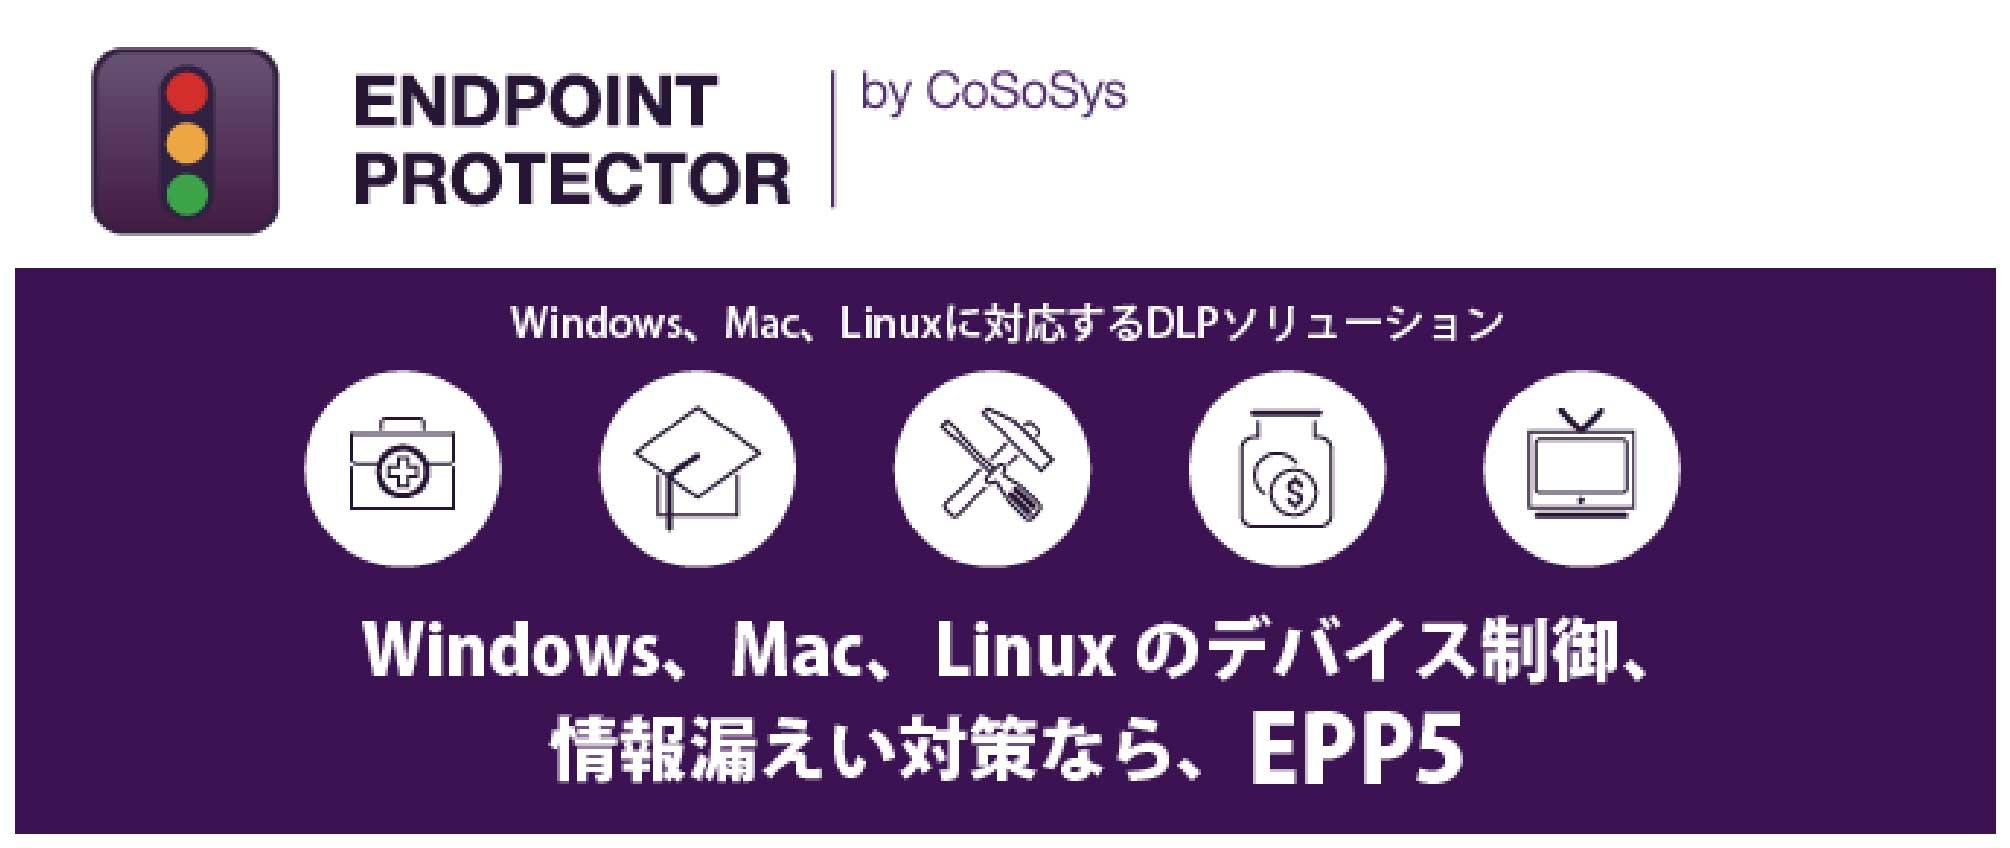 windows、mac、linuxに対応するDLPソリューション。デバイス制御、情報漏洩対策ならEPP5